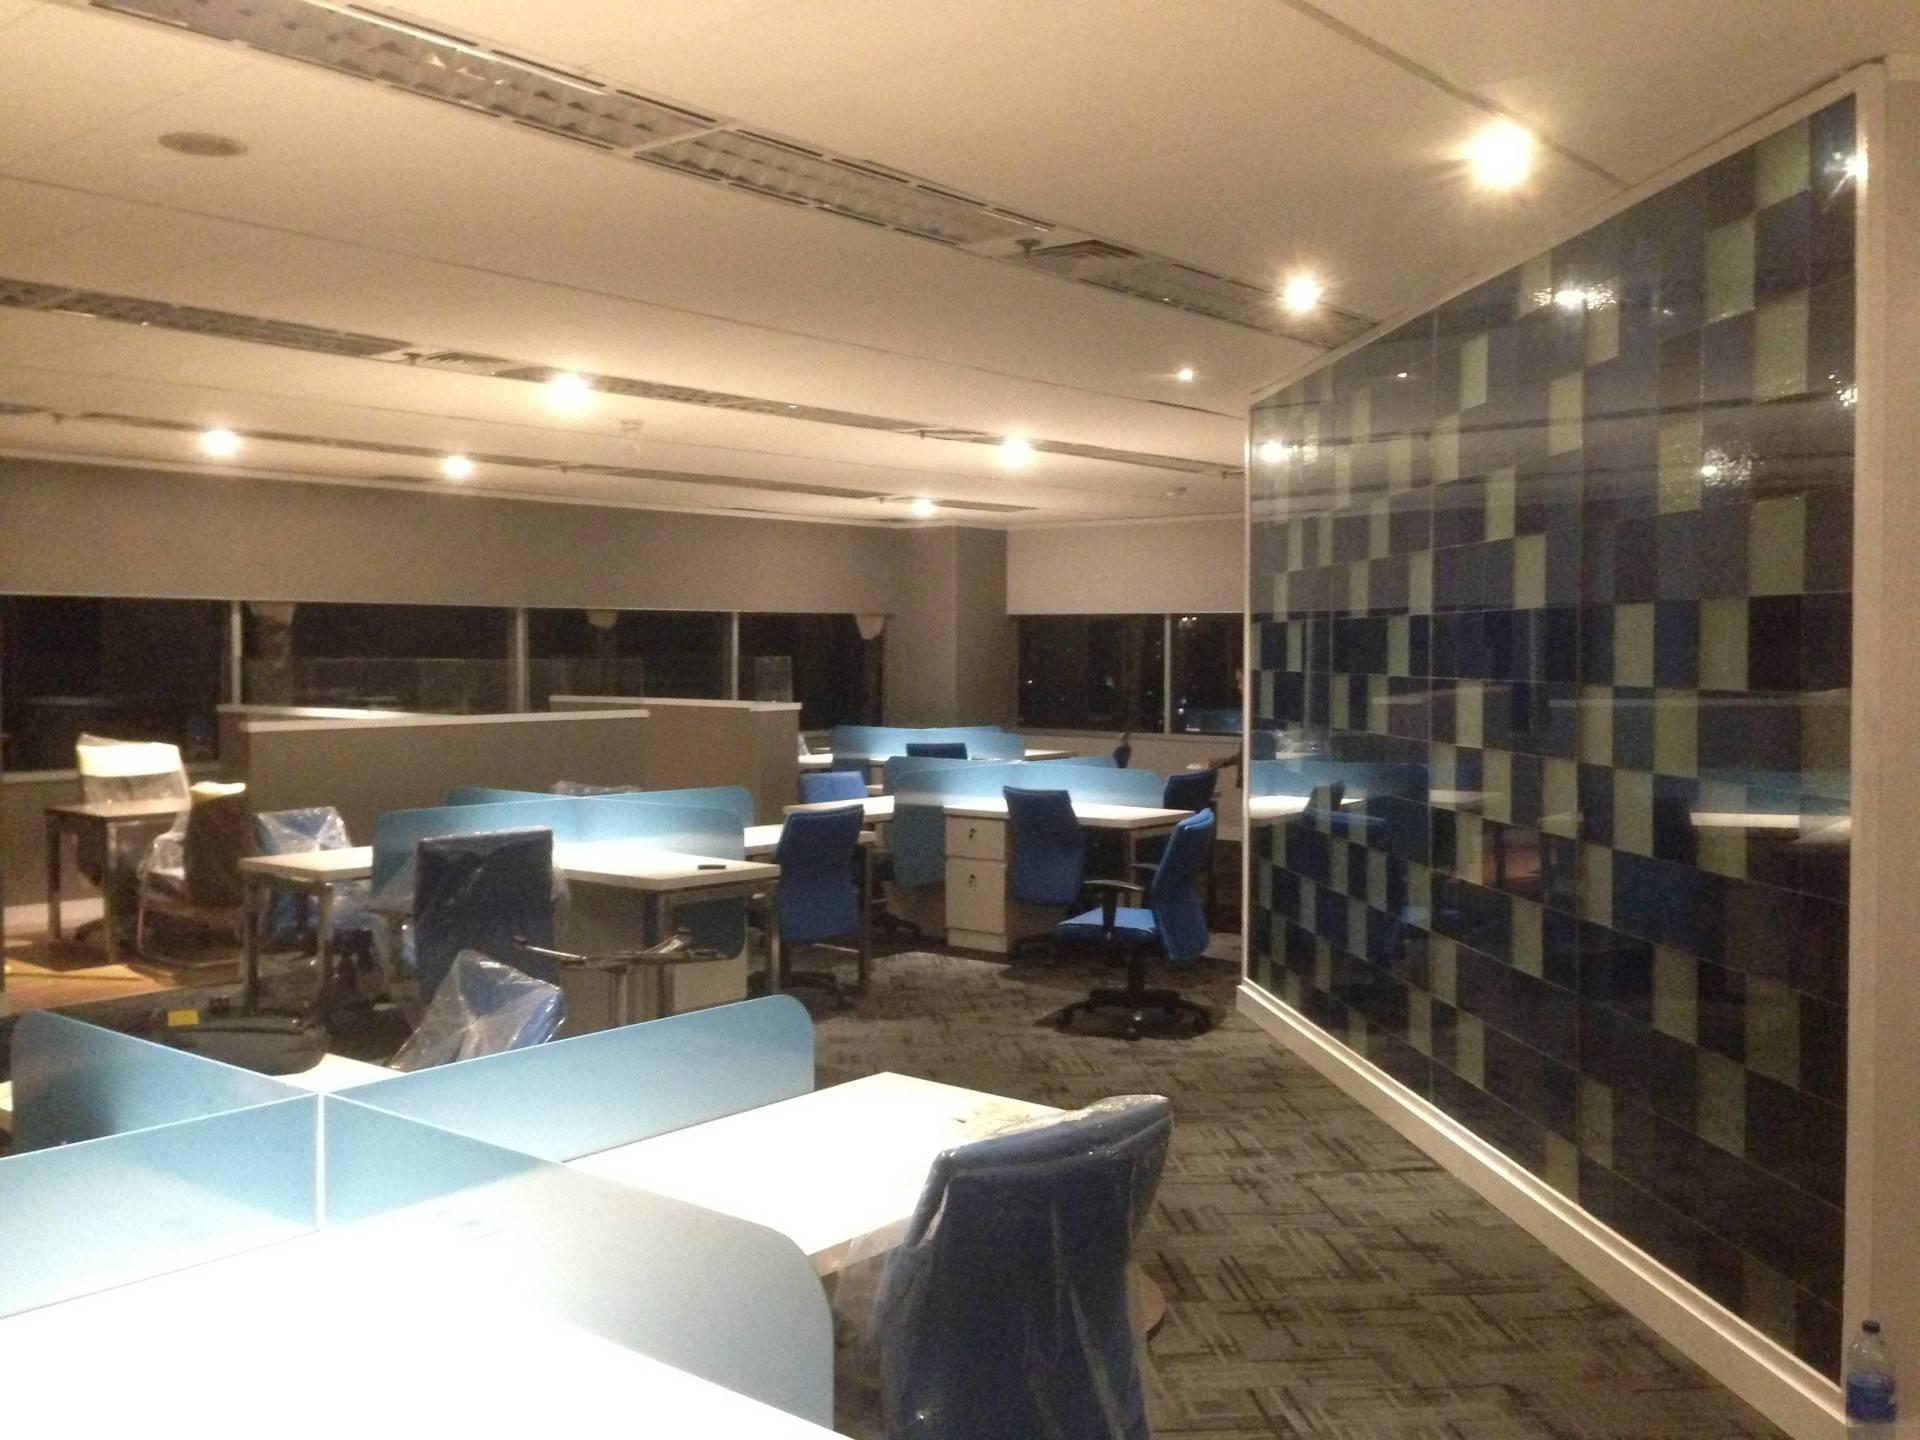 Graharupa Cipta Kirana Flashiz Office Plaza Permata, Jakarta Plaza Permata, Jakarta Workspace Modern  6377